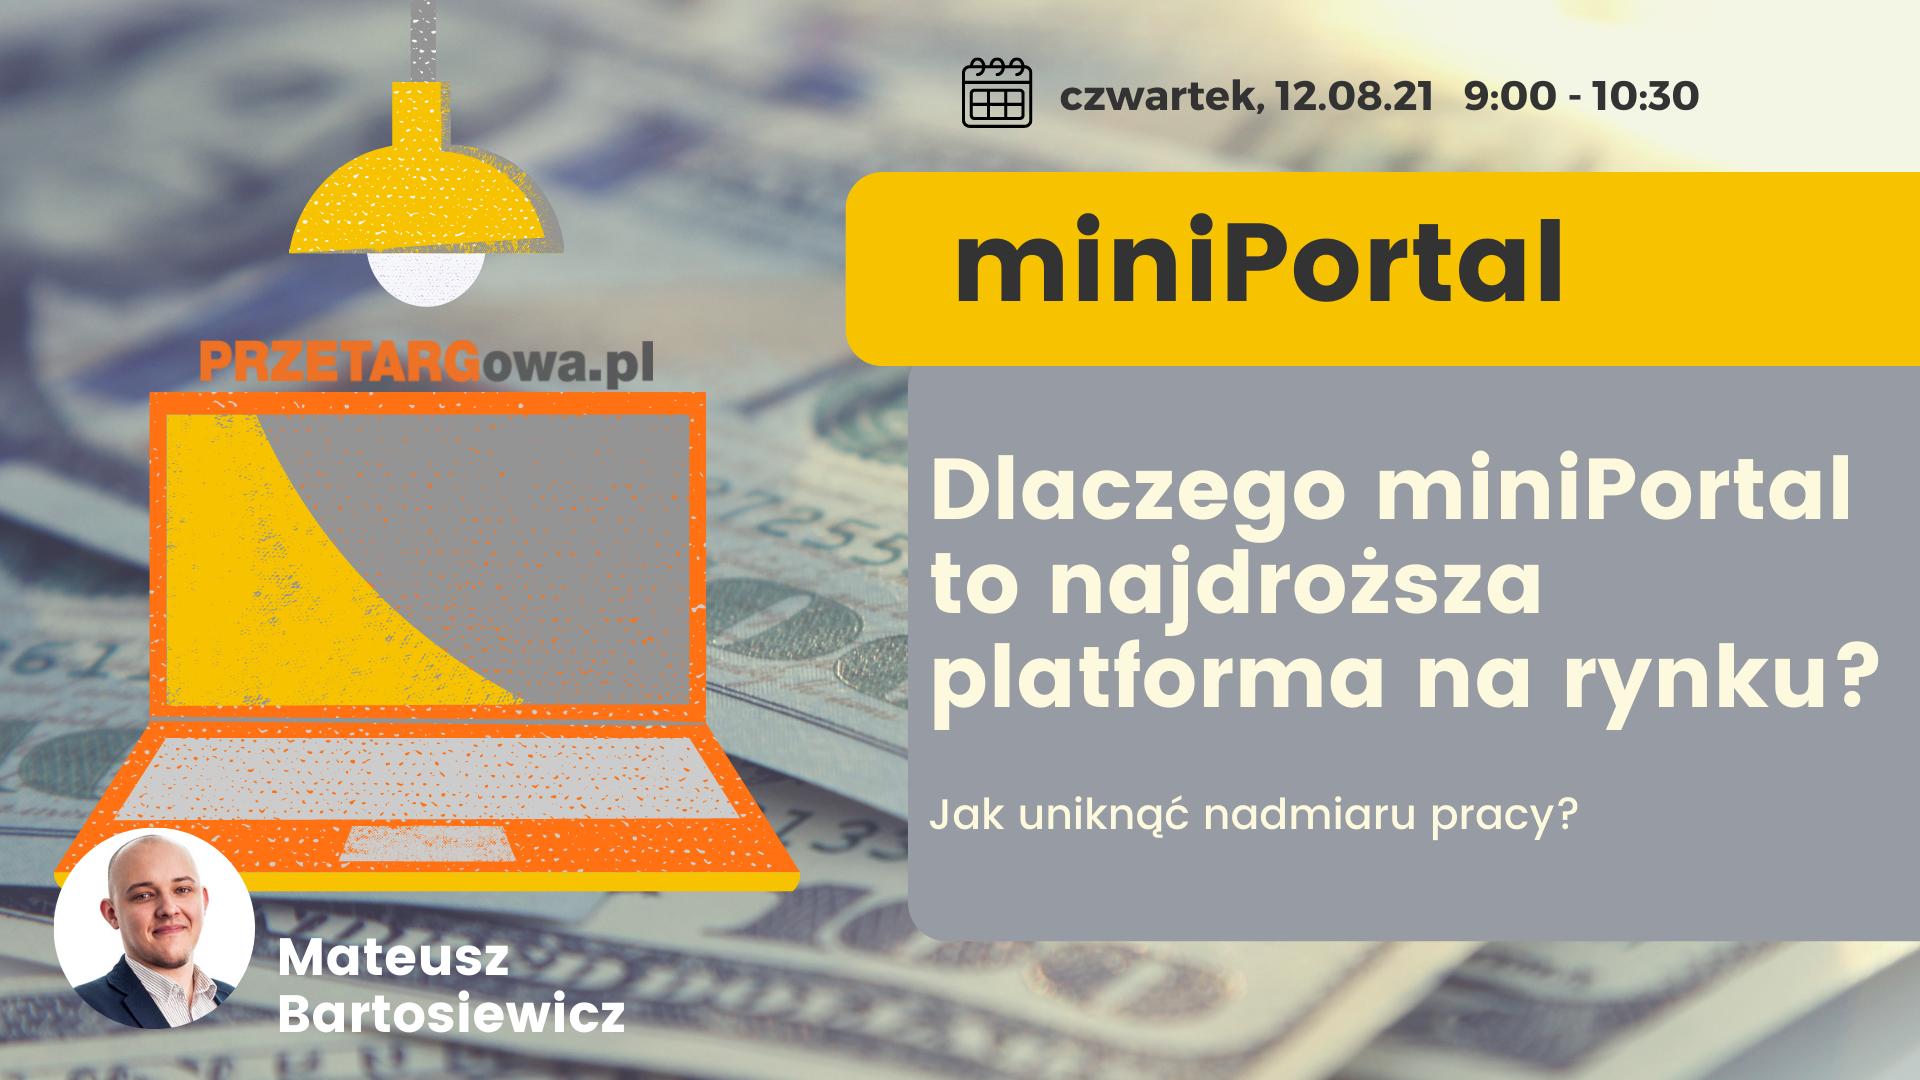 miniPortal — kopia (3)